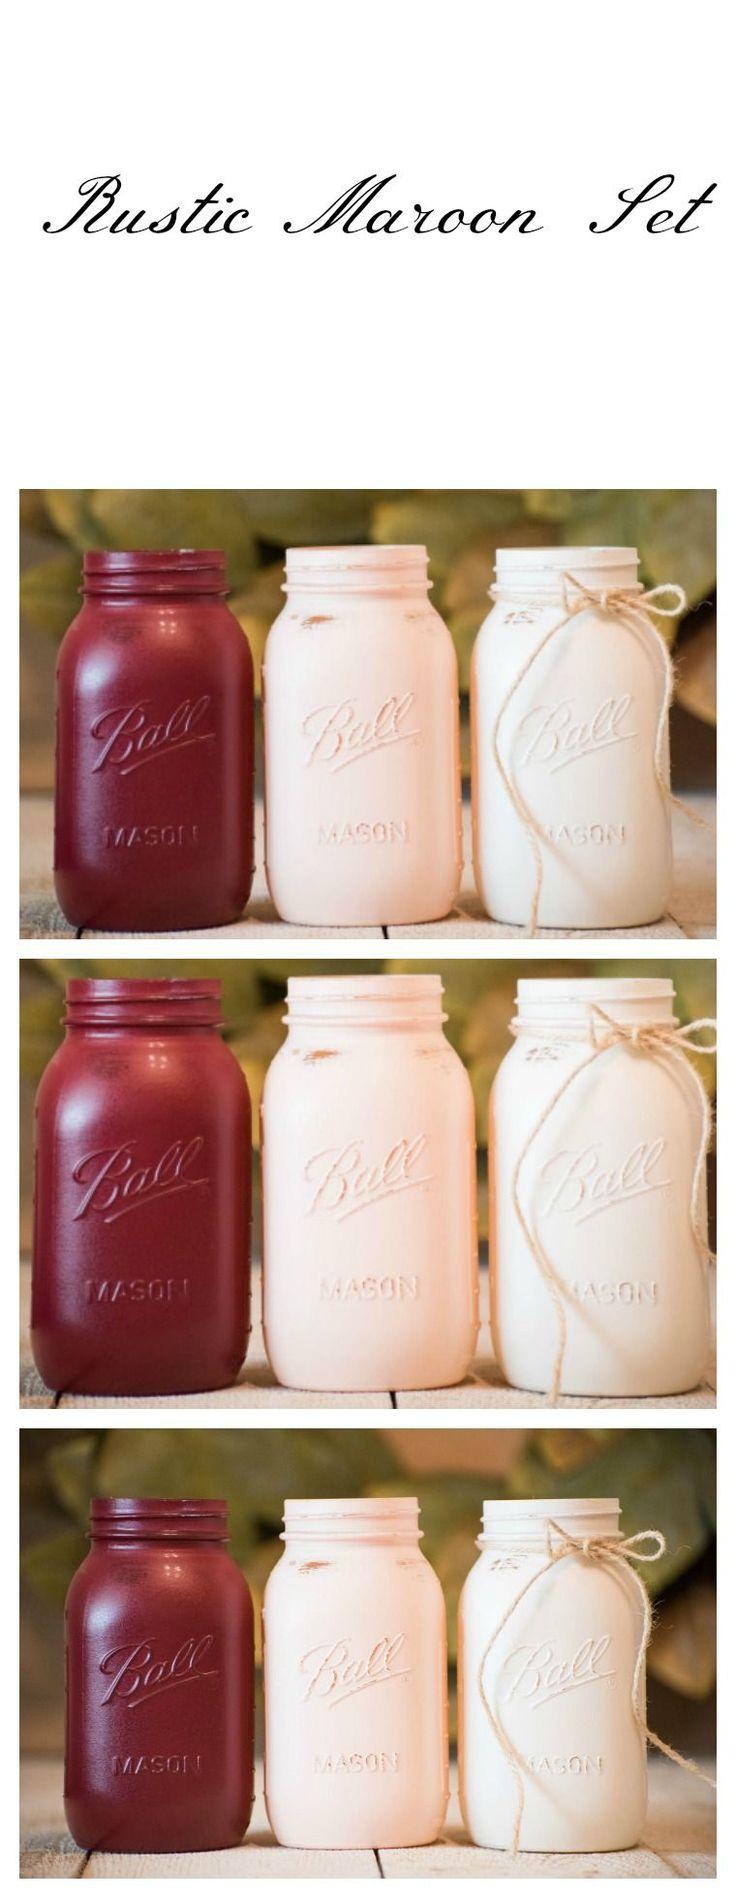 best 25+ maroon wedding ideas on pinterest | maroon wedding colors